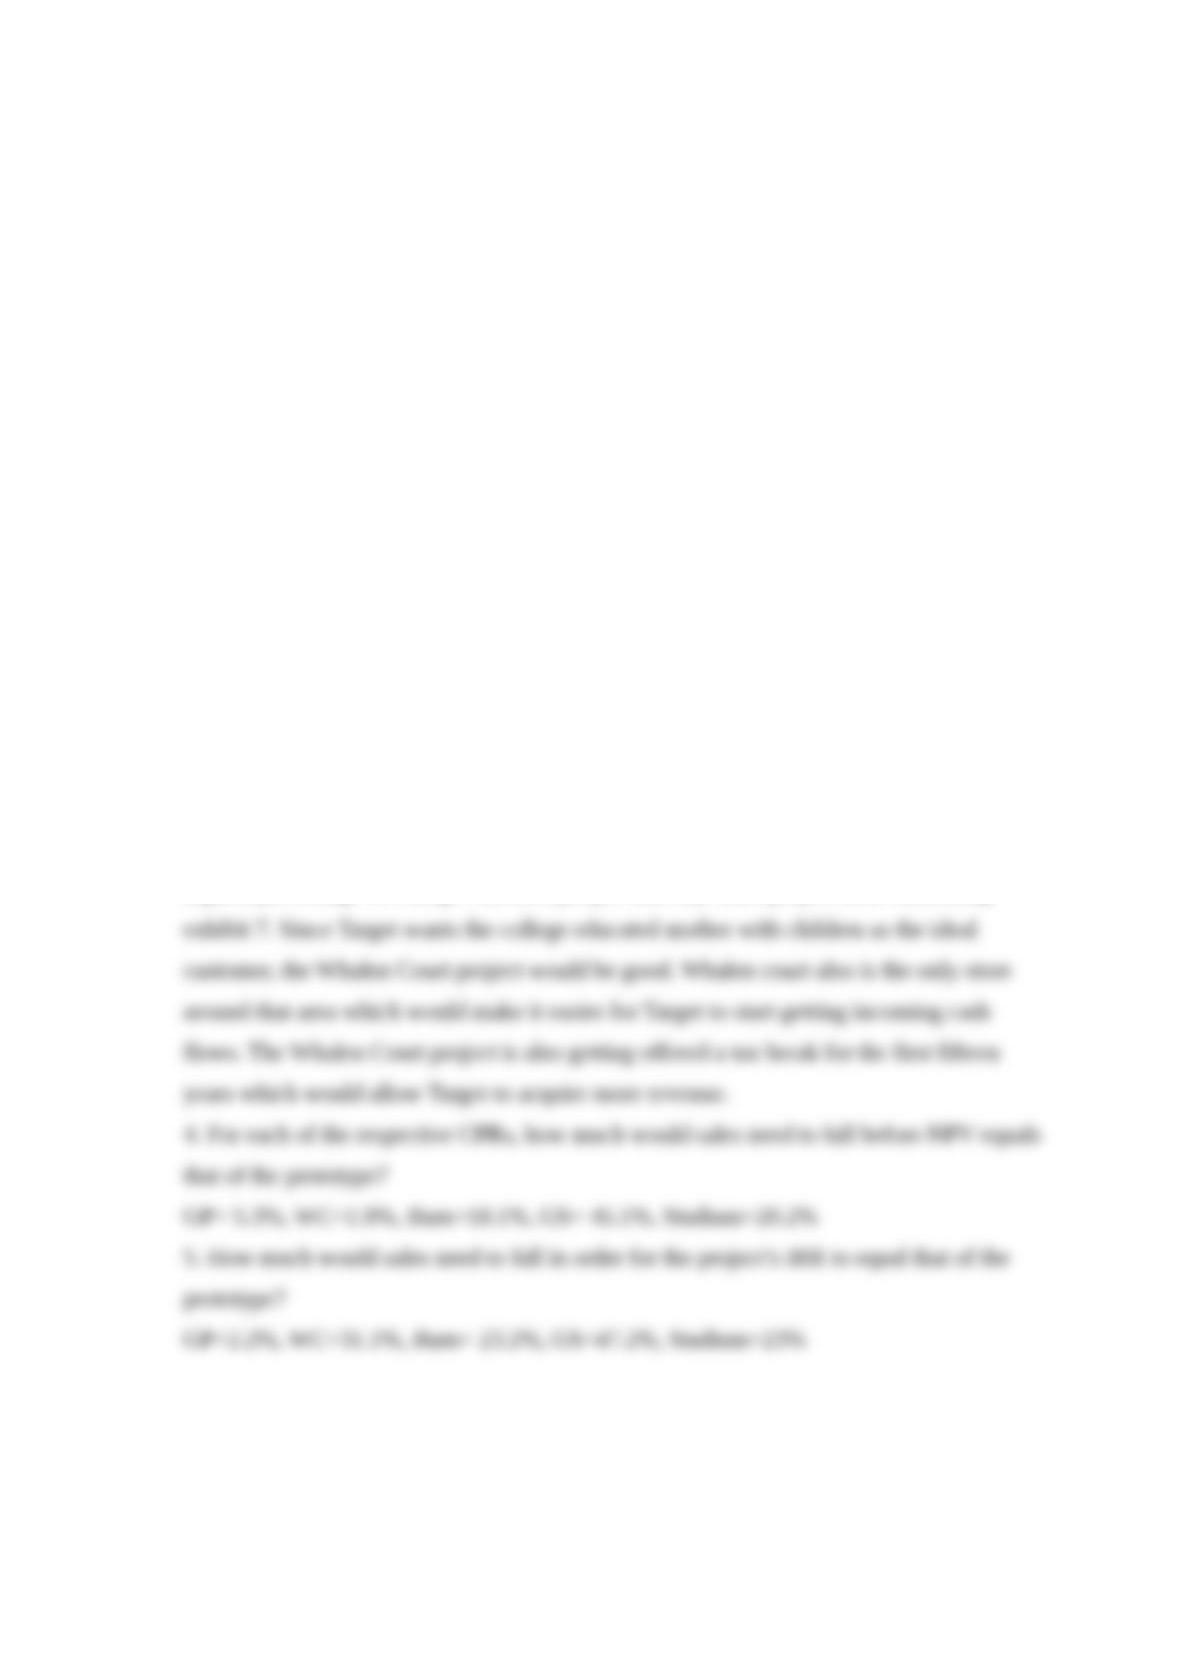 Apa essay writing software